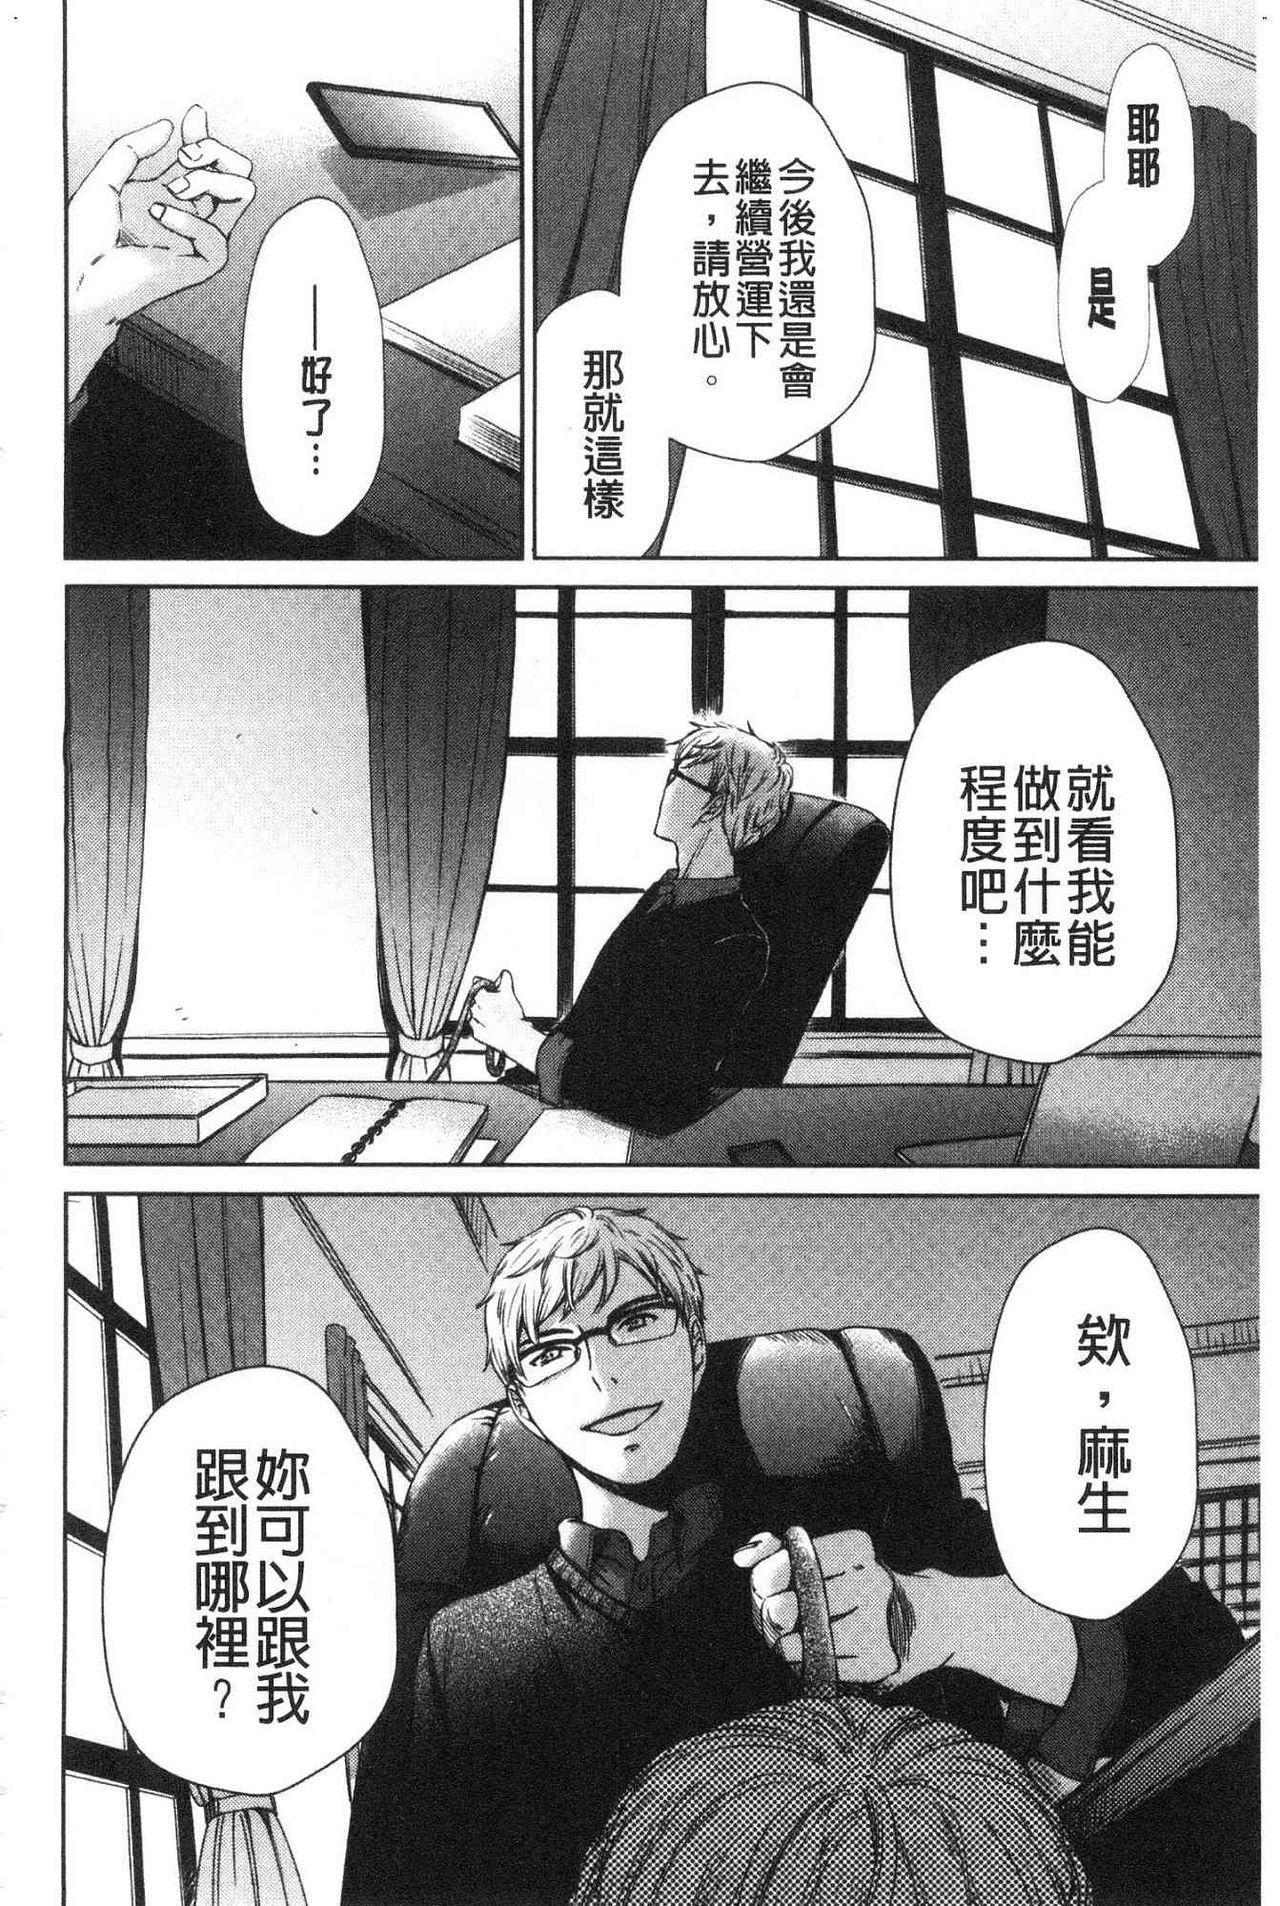 [Gotoh Akira]  21-ji no Onna ~Camera no Mae no Mesuinu~ 2 | 21時之女 ~鏡頭前的牝犬~ 2 [Chinese] 203